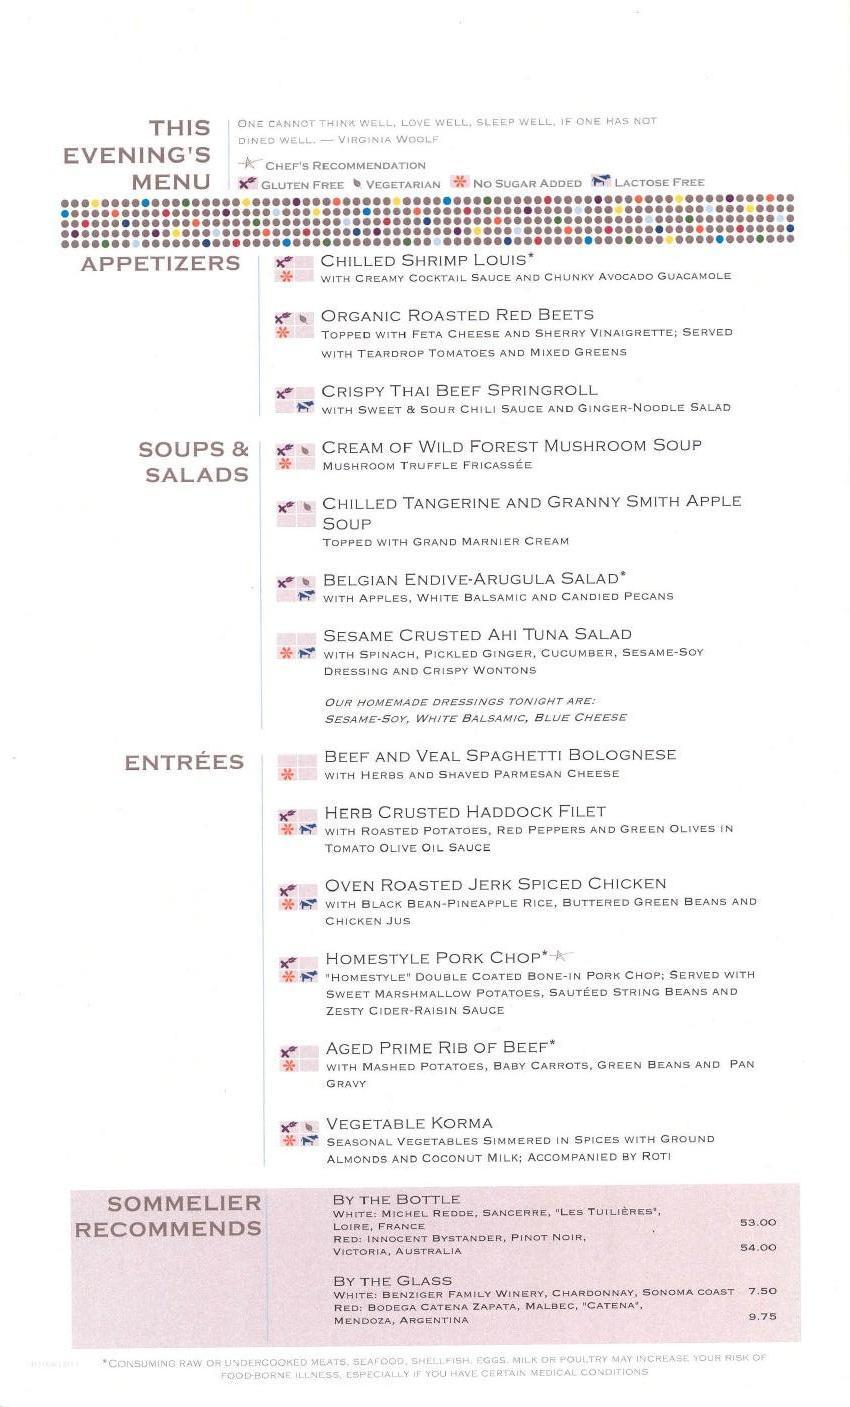 Murano menu celebrity eclipse pictures